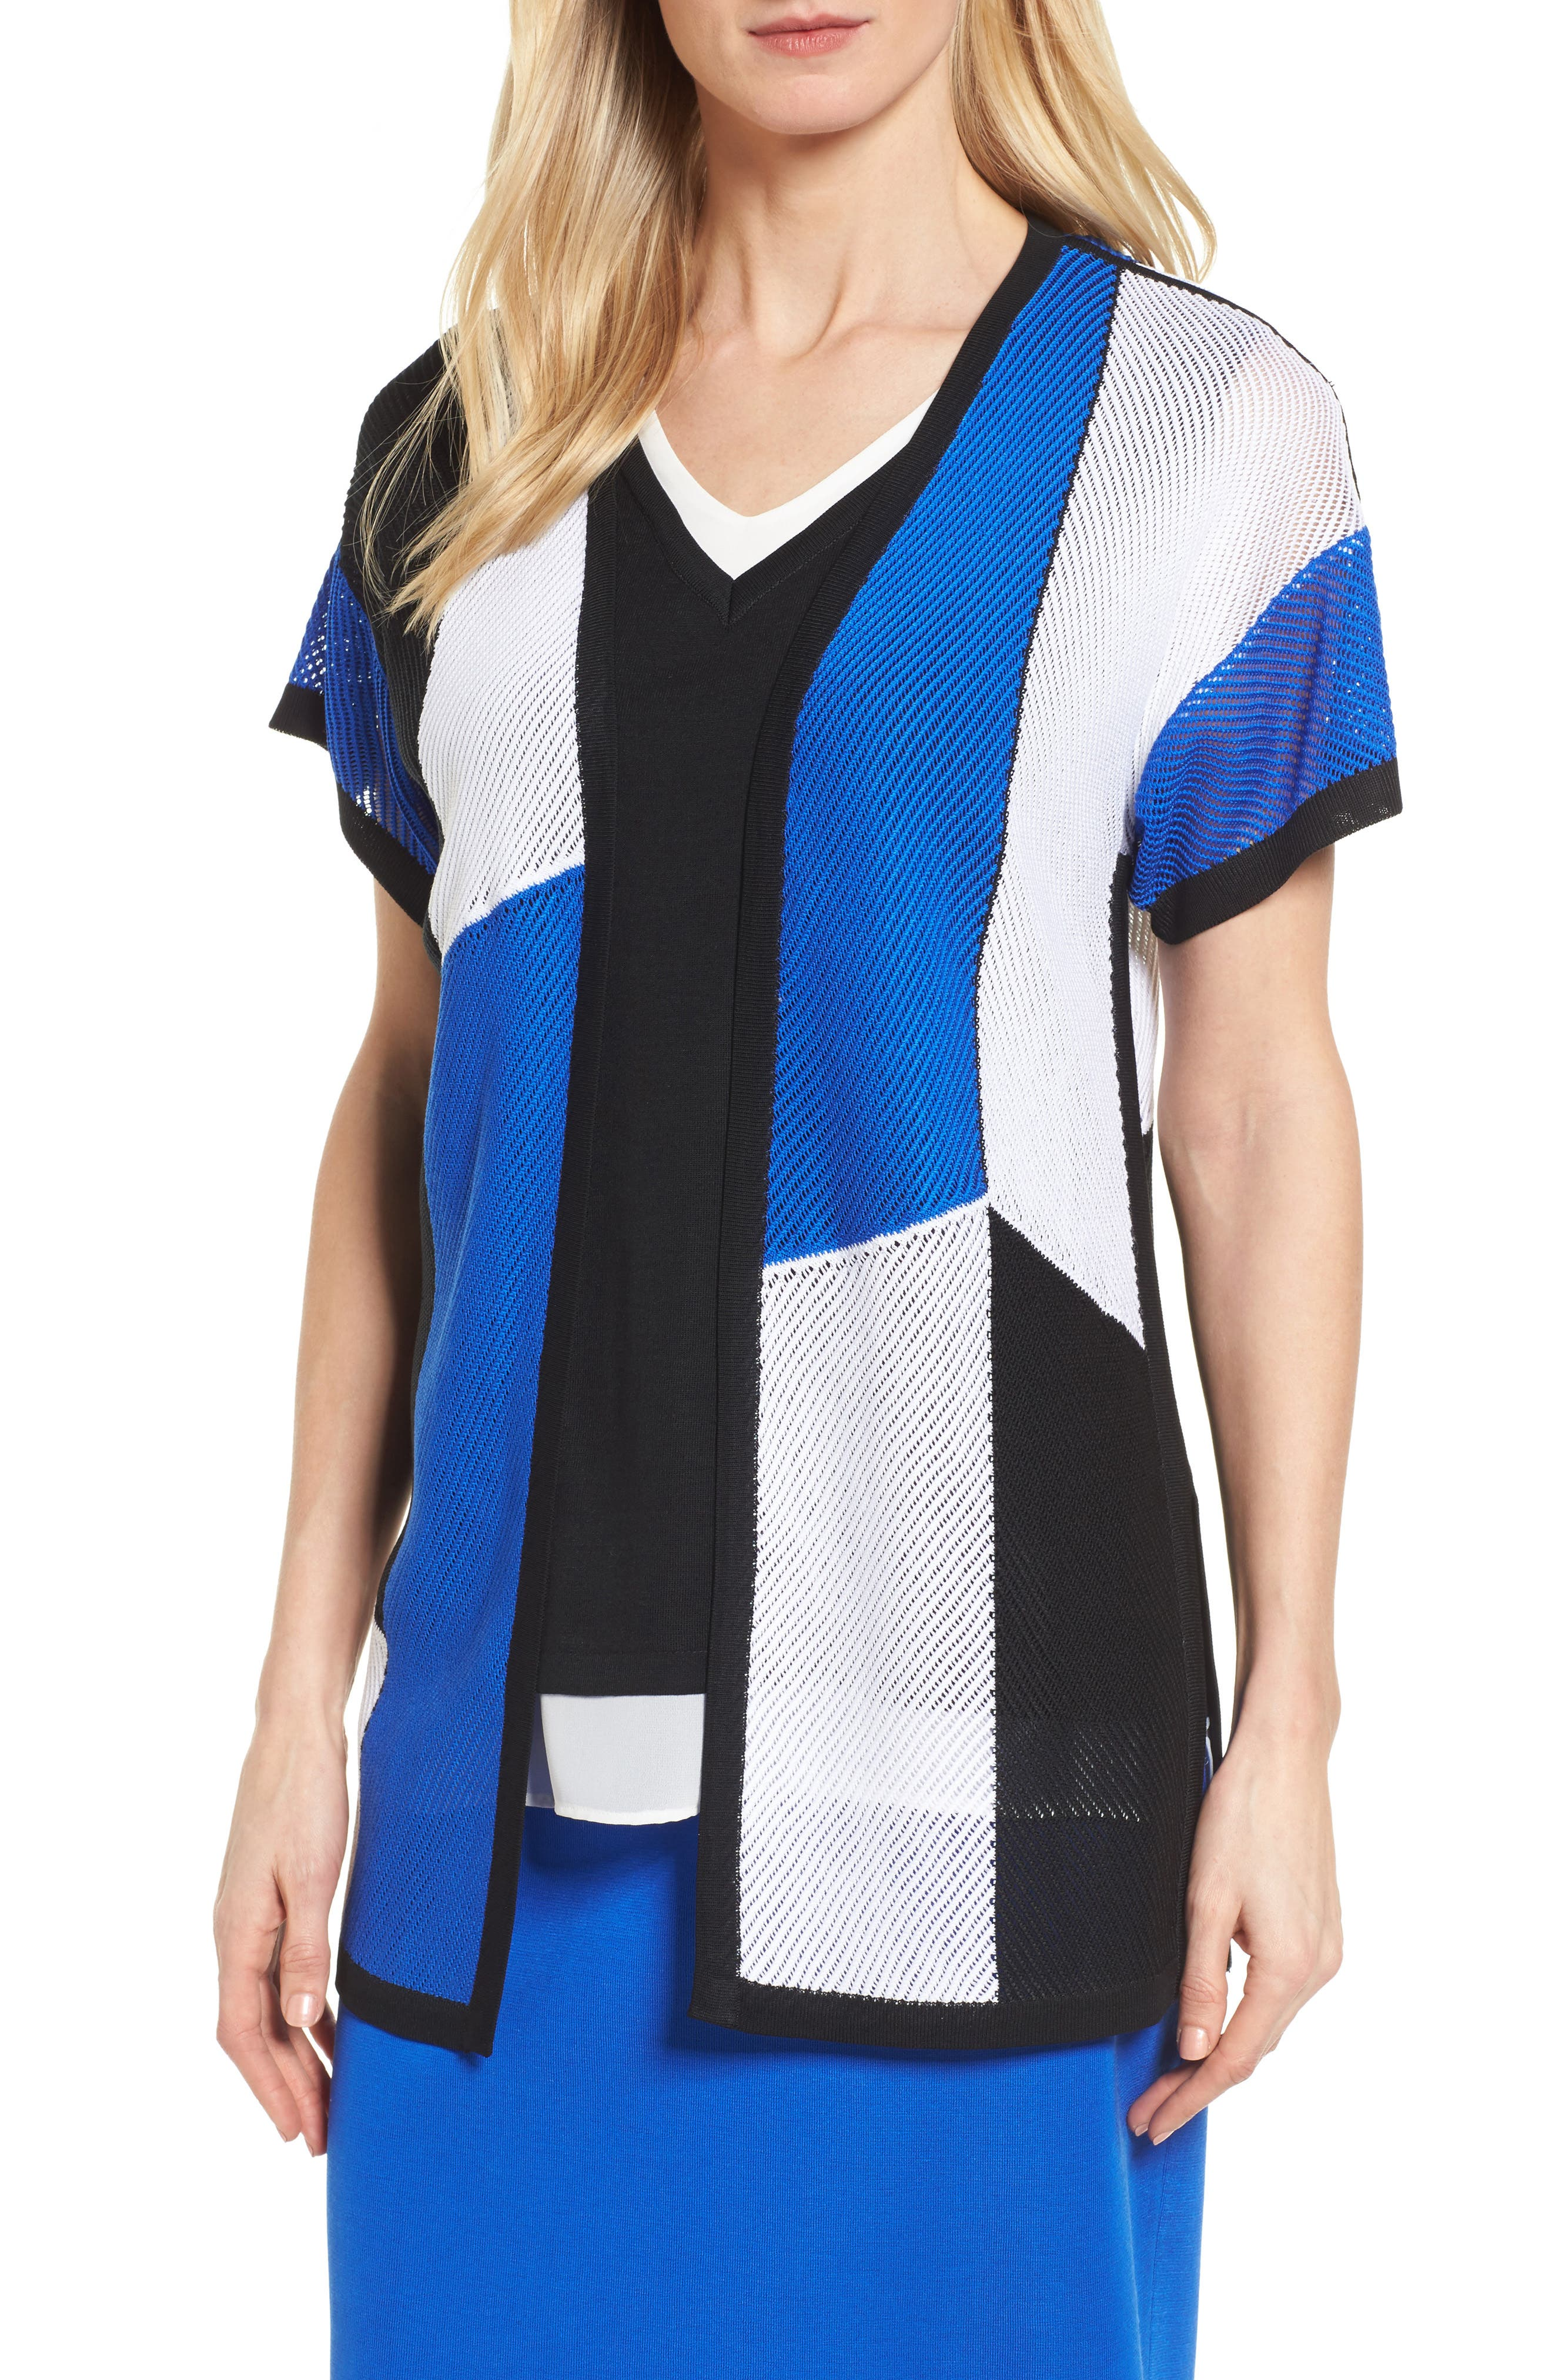 Colorblock Short Sleeve Cardigan,                         Main,                         color, White/ Black/ Patriot Blue